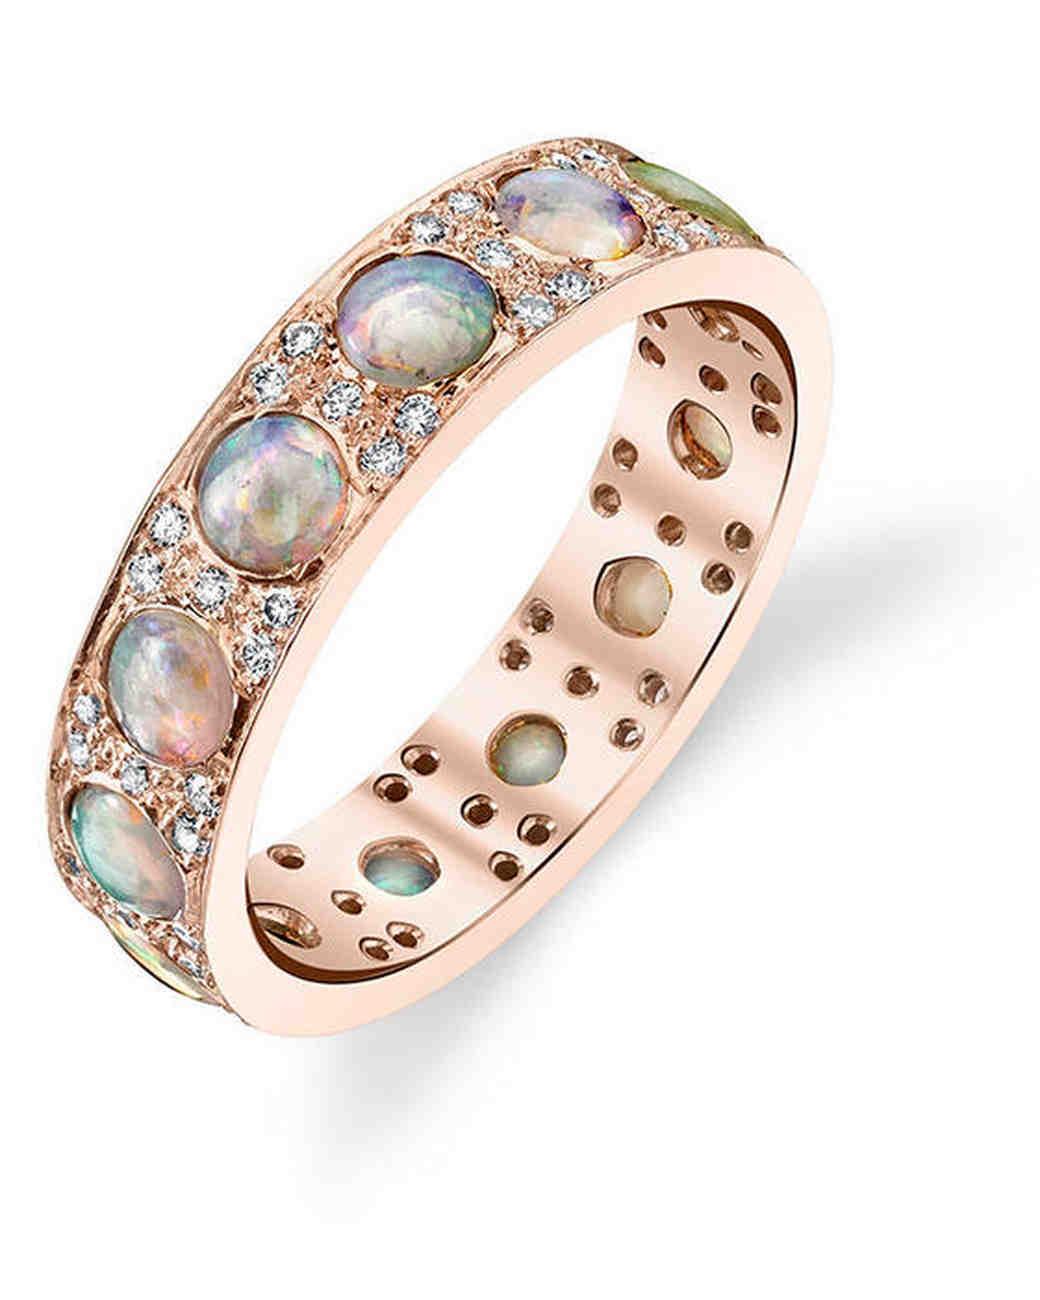 eternity-bands-colored-stones-irene-neuwirth-opal-diamond-stacking-ring-0515.jpg